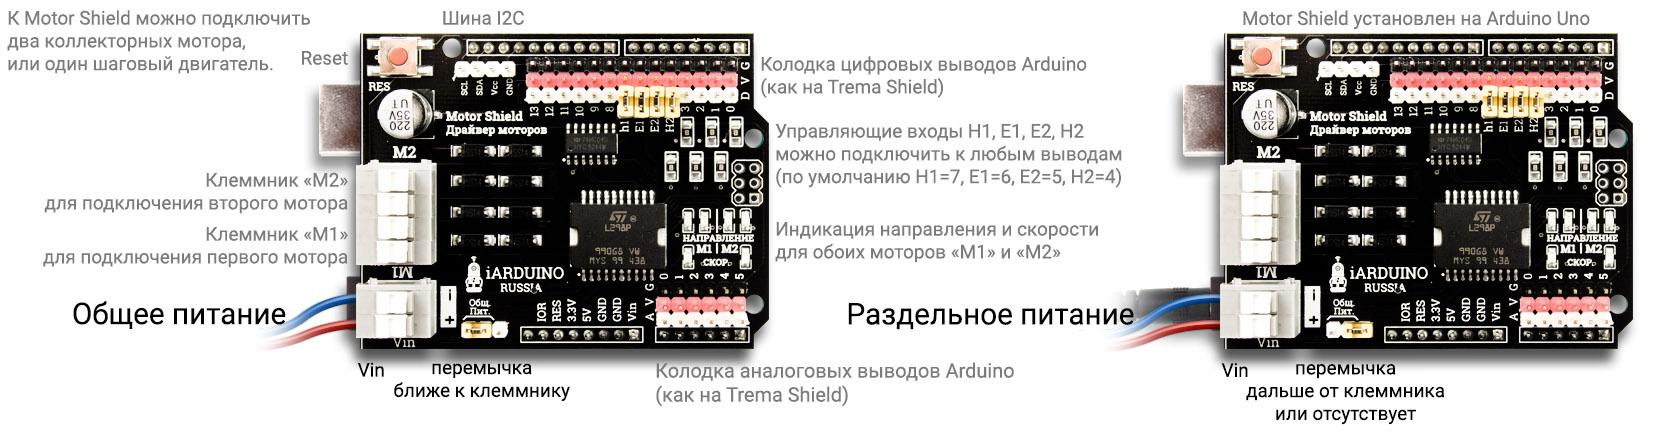 Назначение выводов motorShield на базе чипа L298